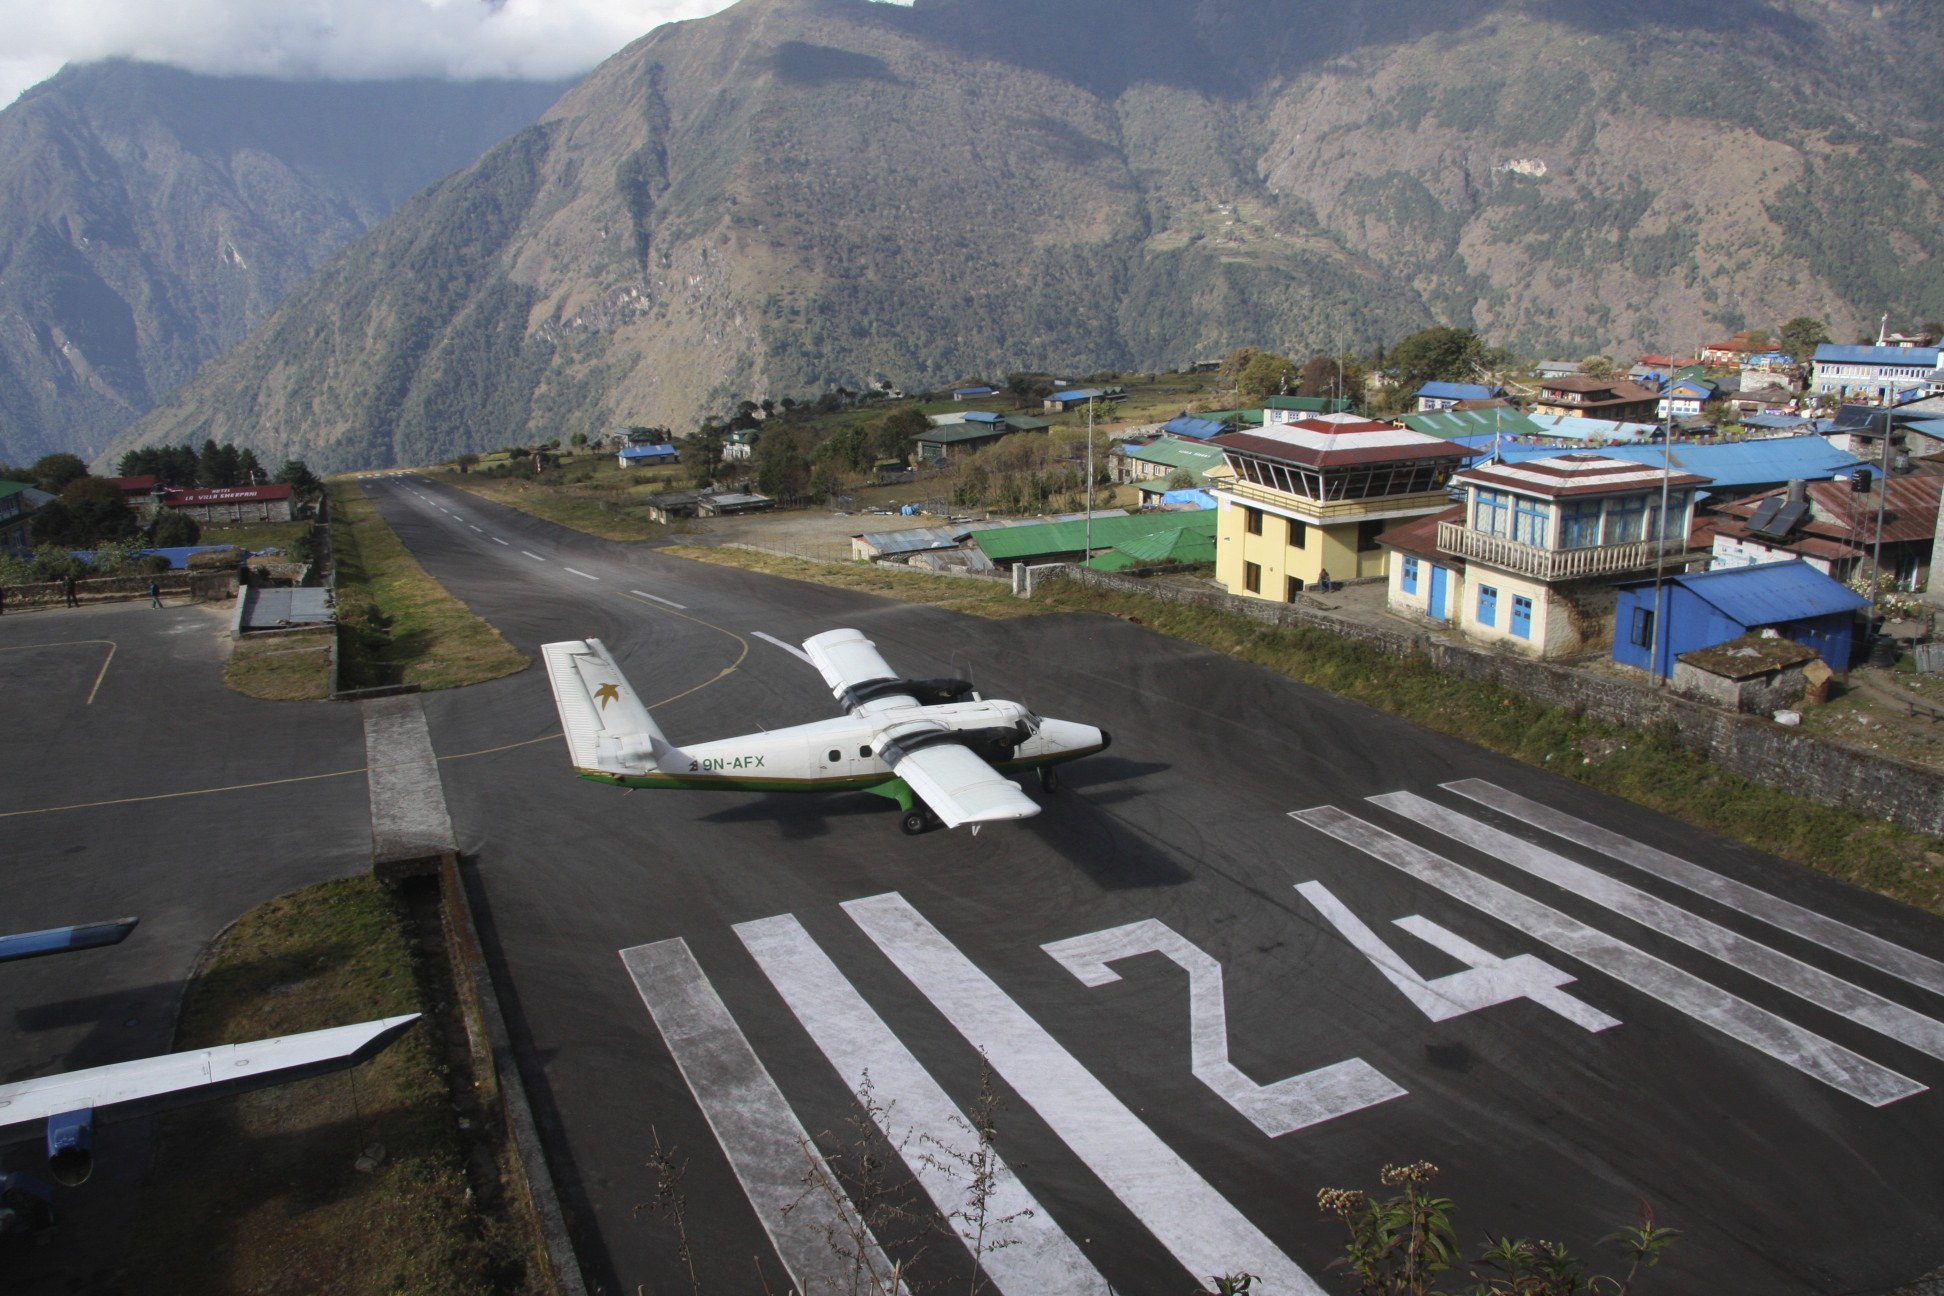 Lula airstrip